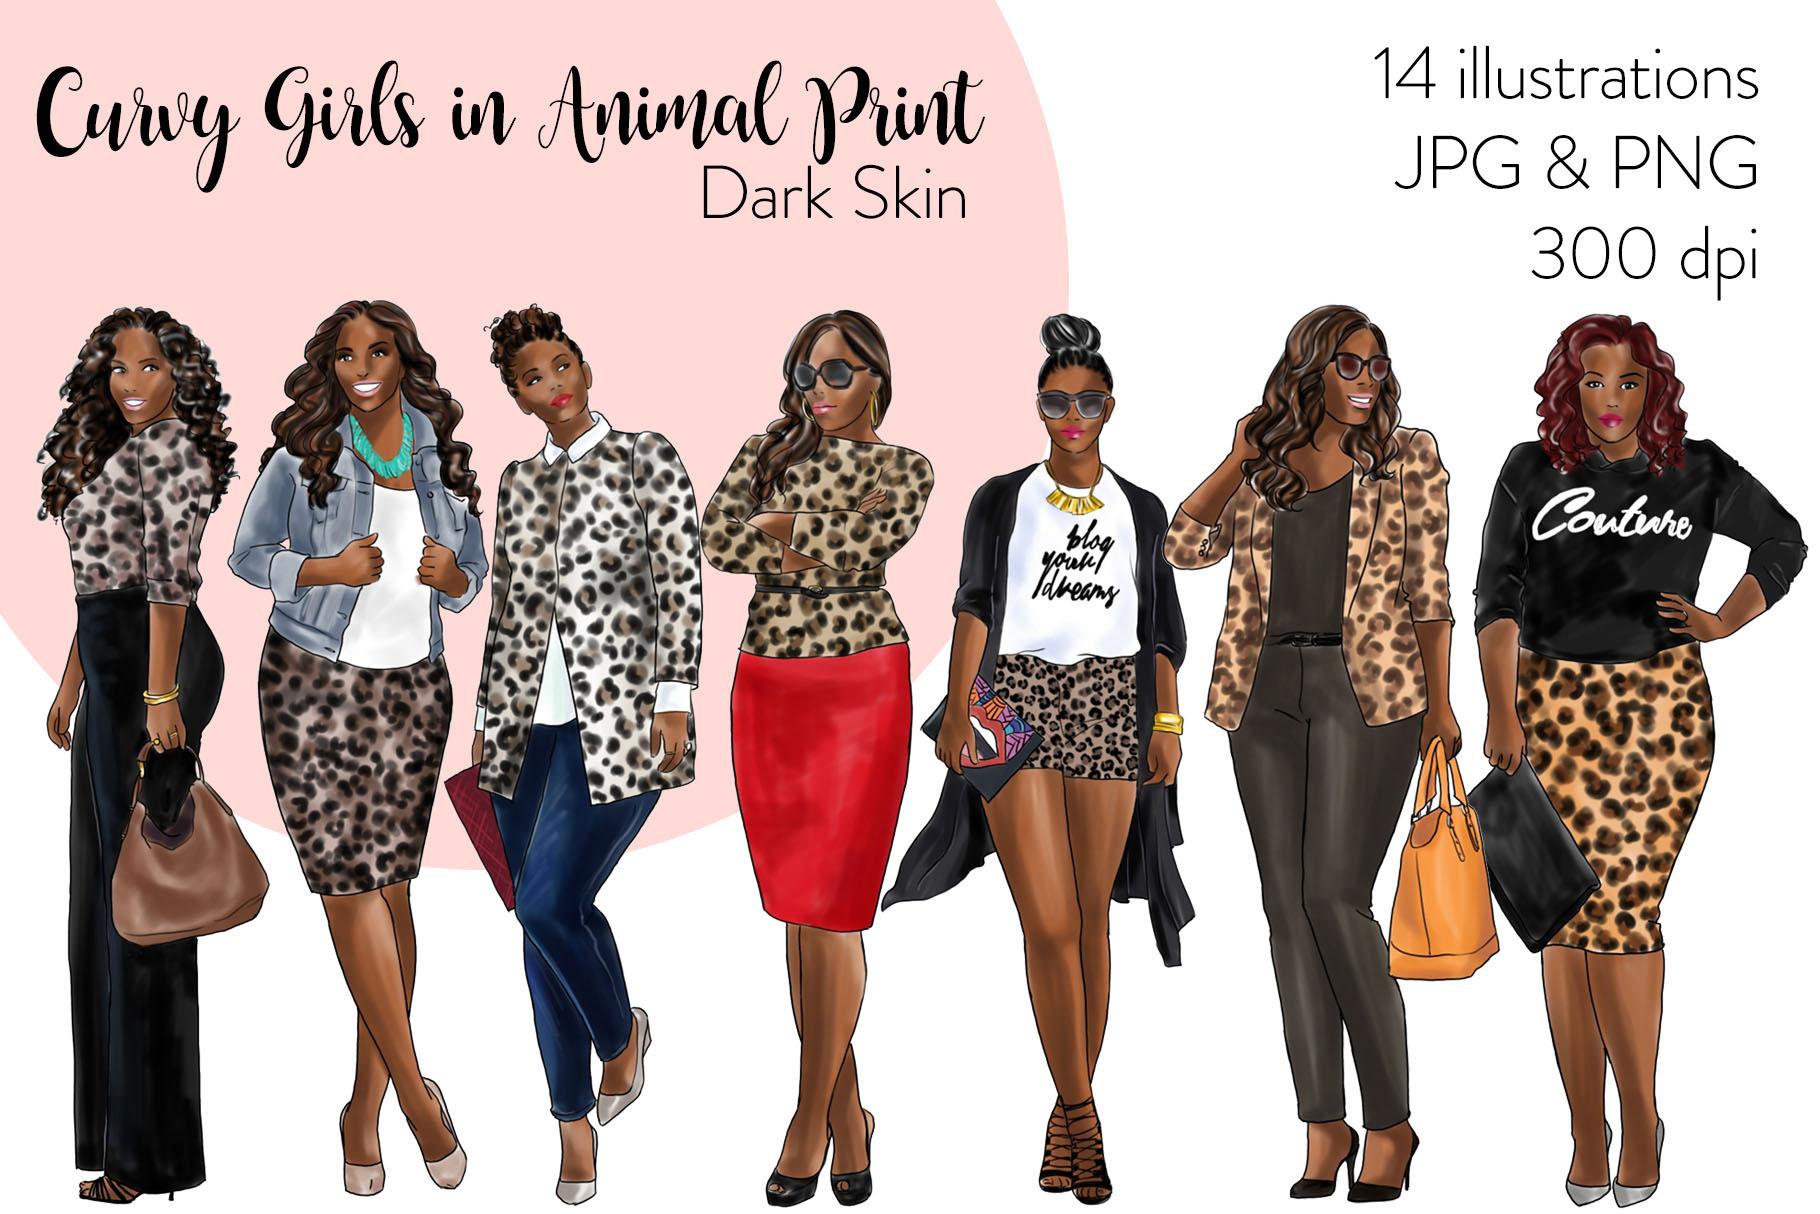 Fashion clipart - Curvy Girls in Animal Print - Dark Skin example image 1